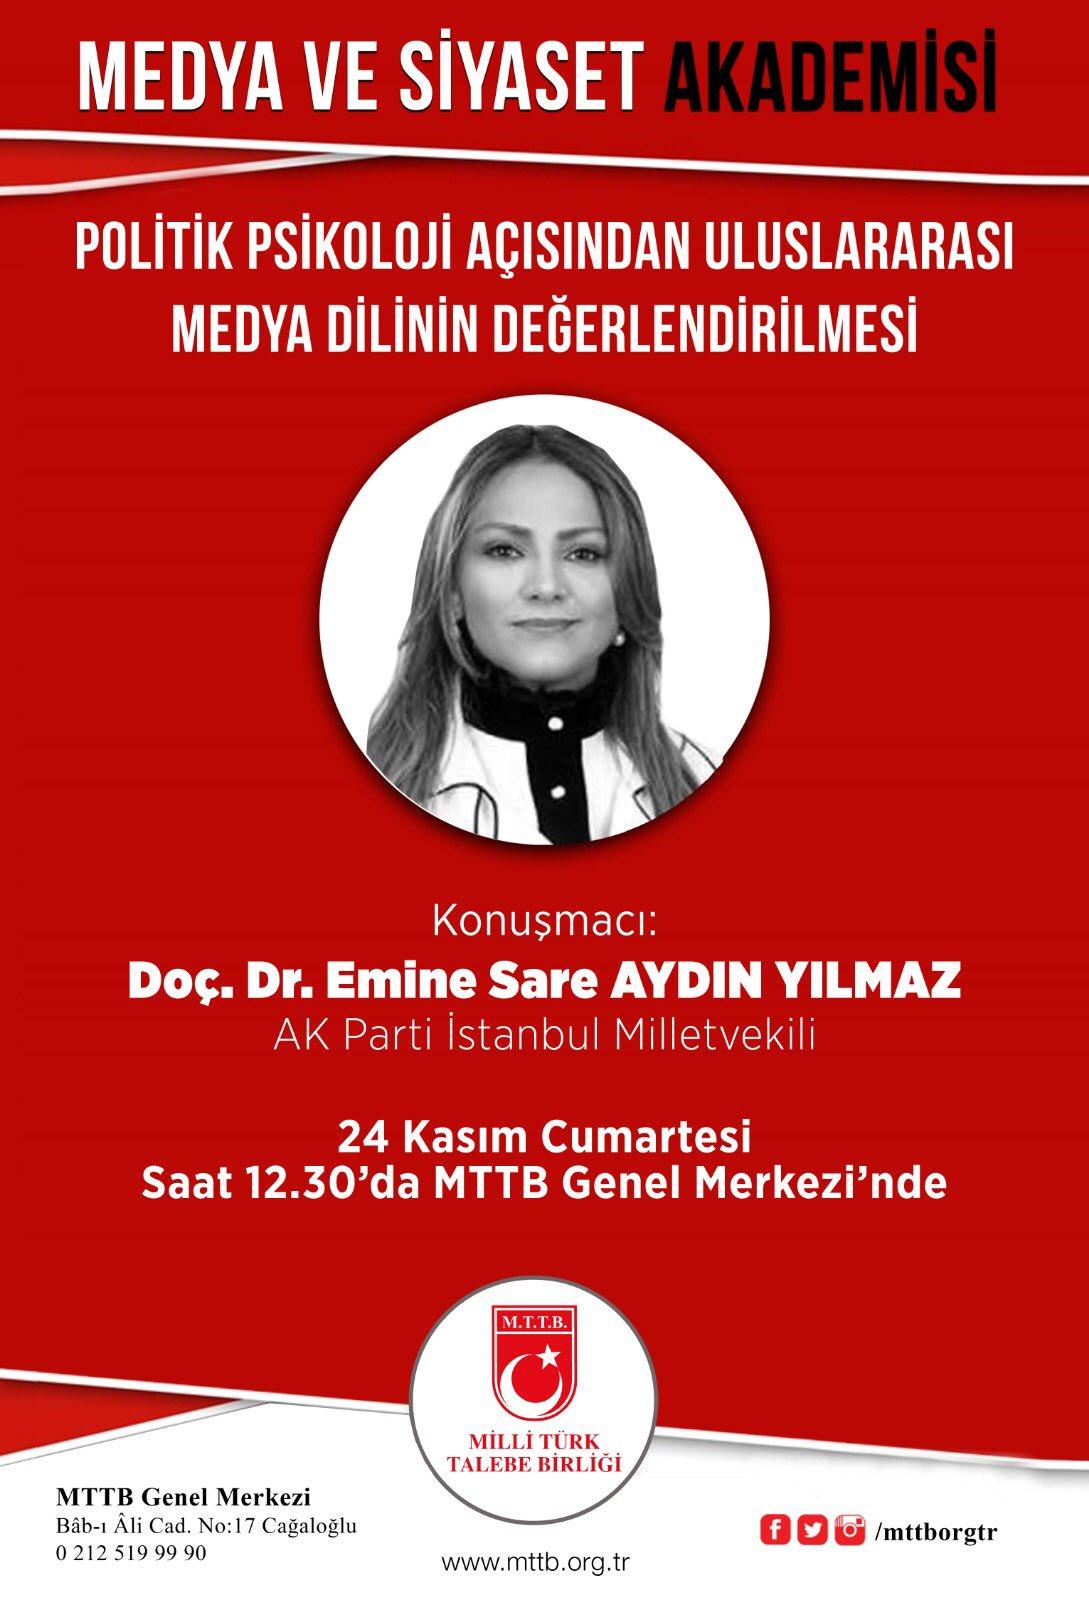 MEDYA VE SİYASET AKADEMİSİ 3. HAFTA